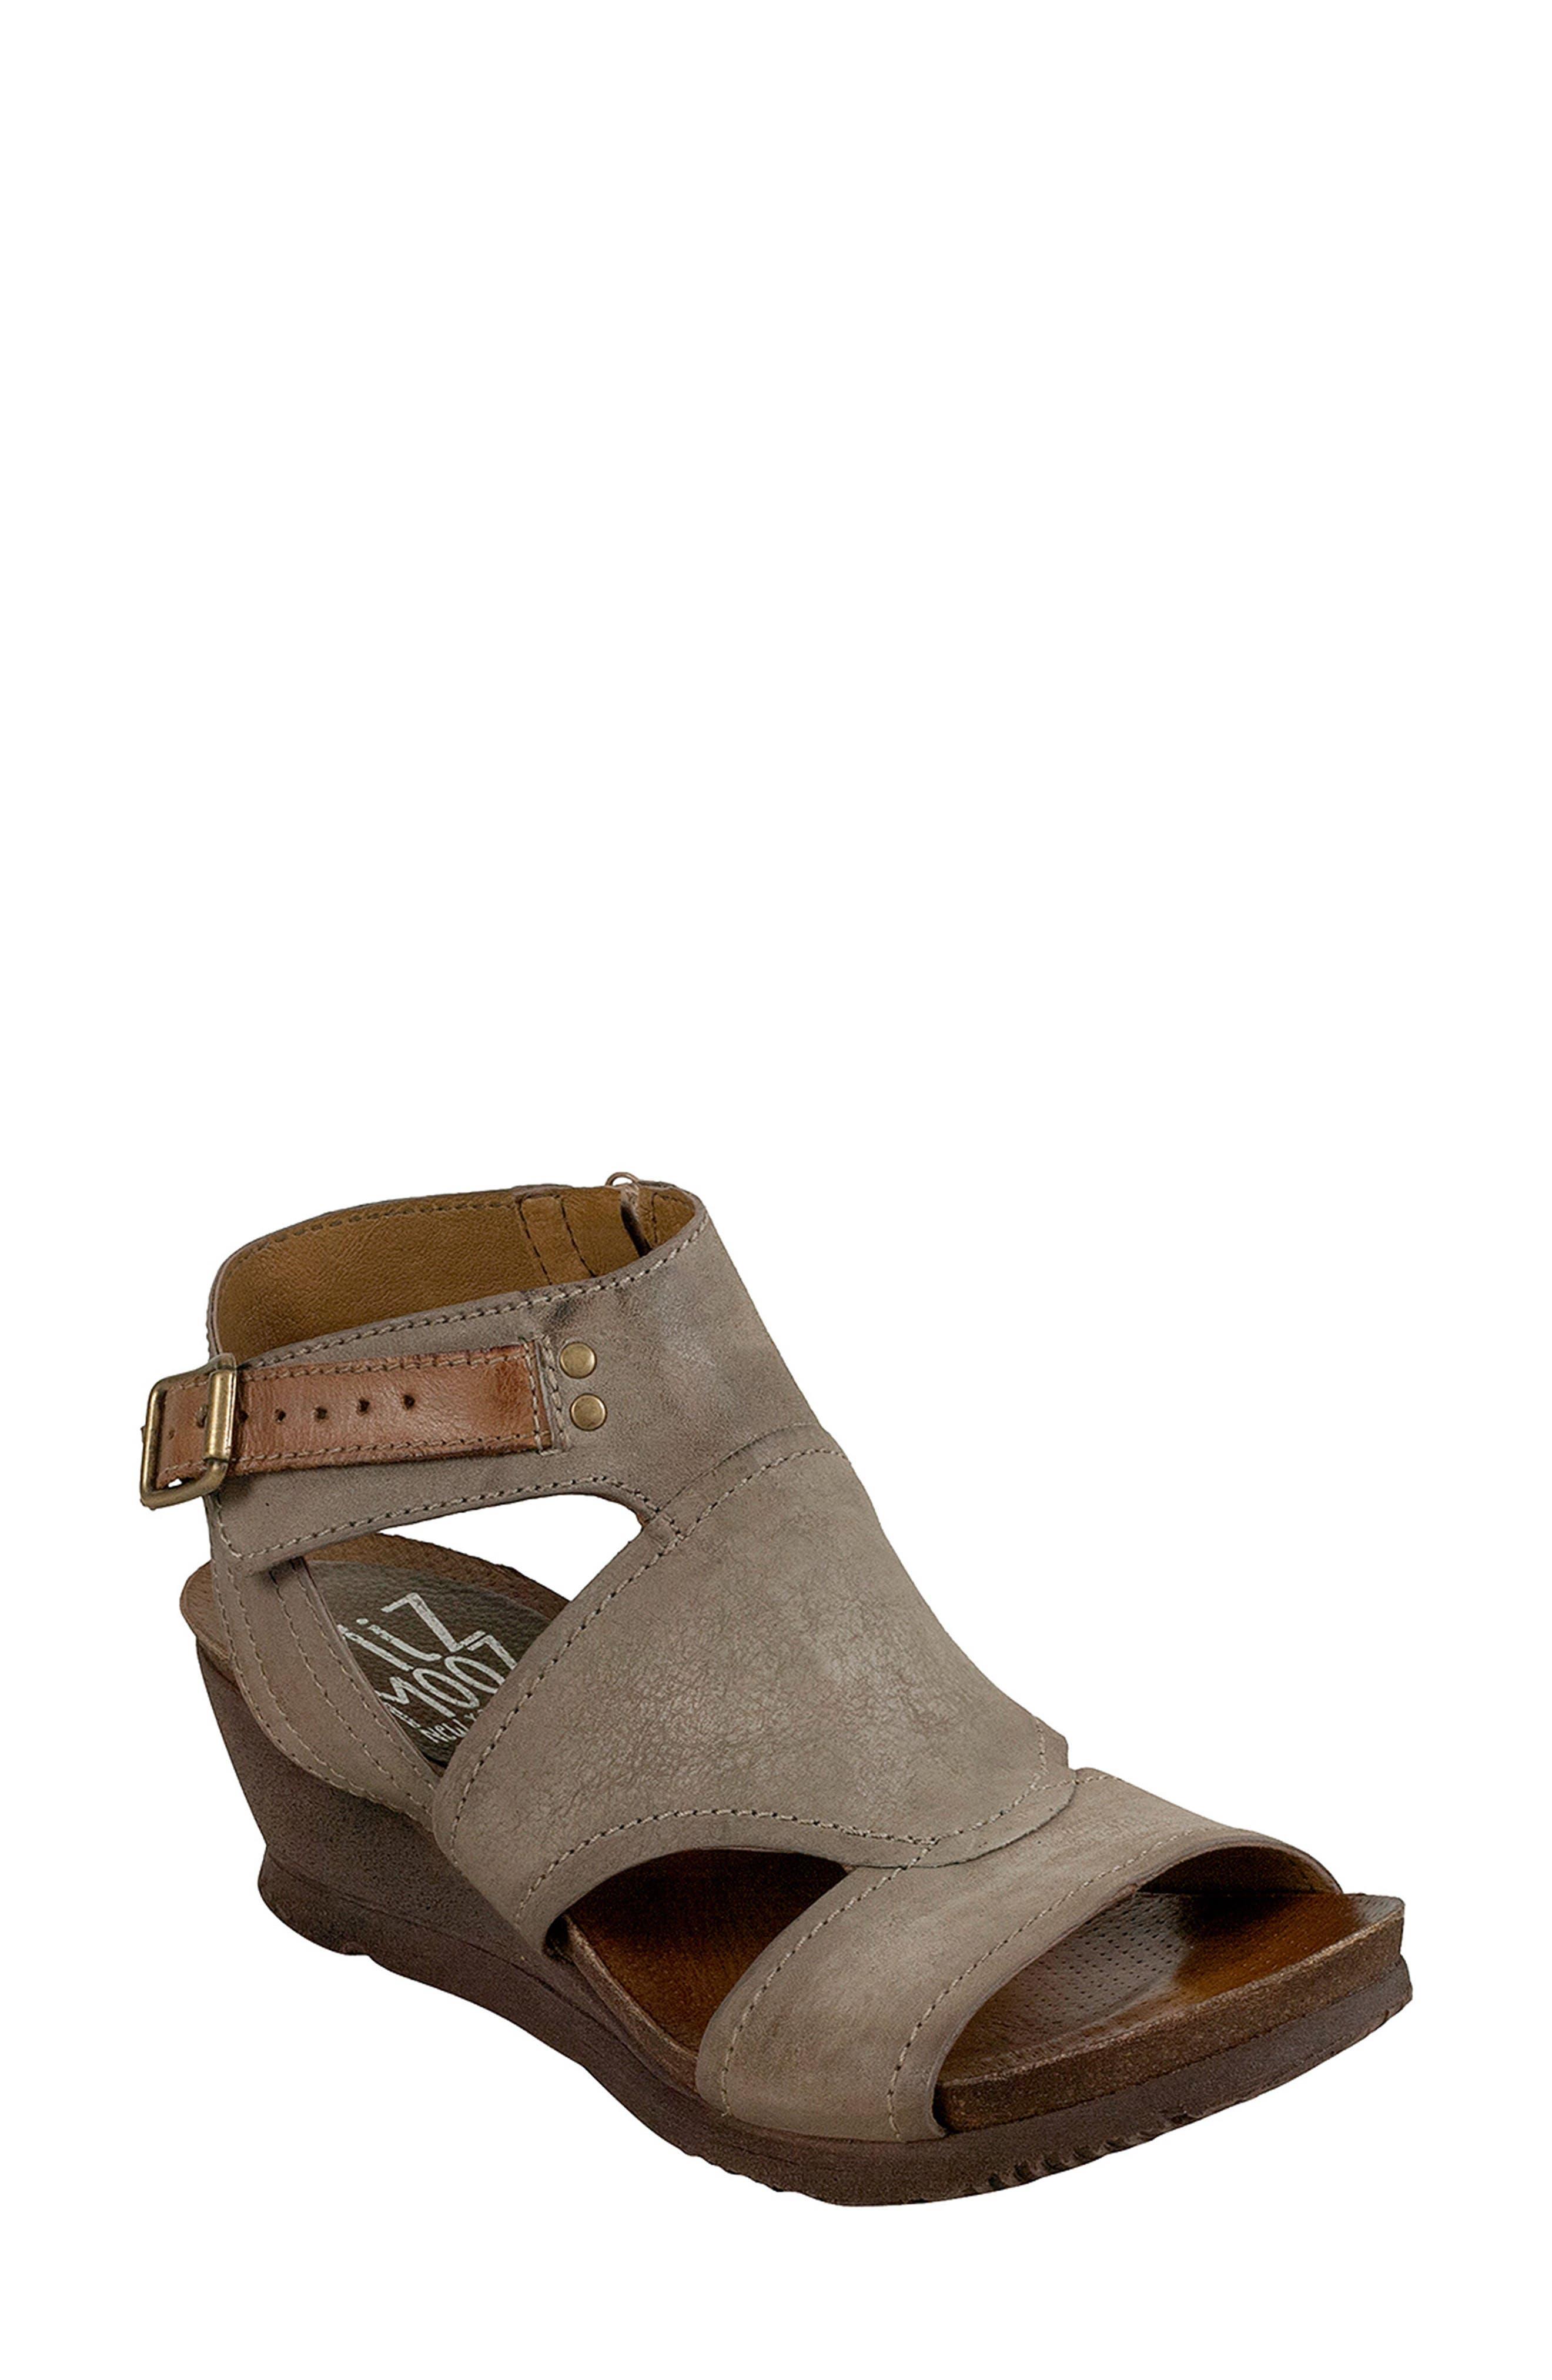 Miz Mooz Scout Wedge Sandal (Women)